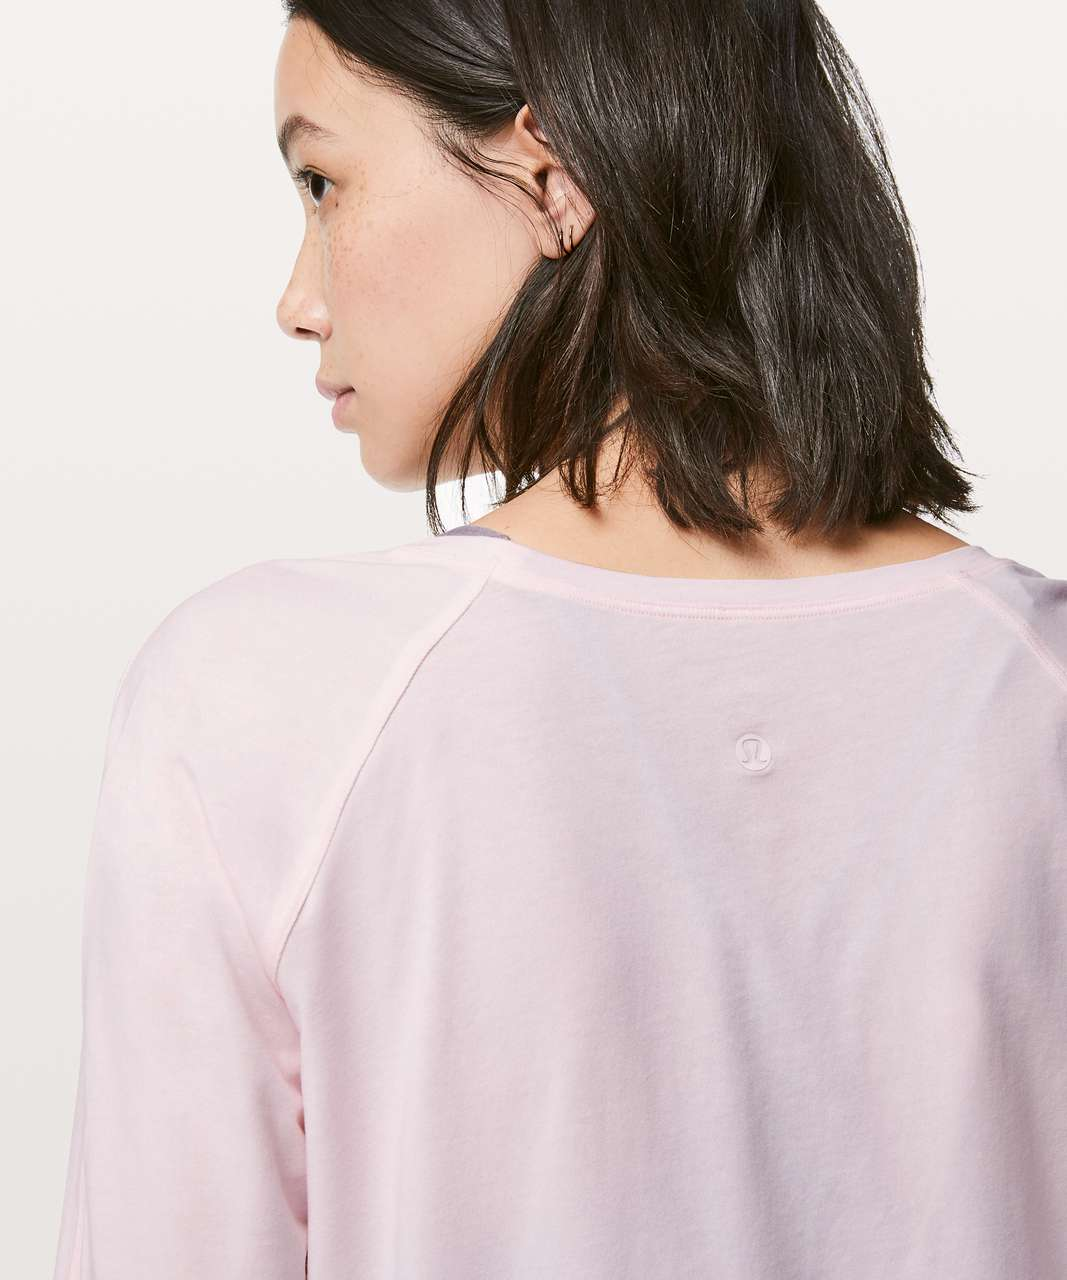 Lululemon Emerald Long Sleeve - Pink Glow (First Release)